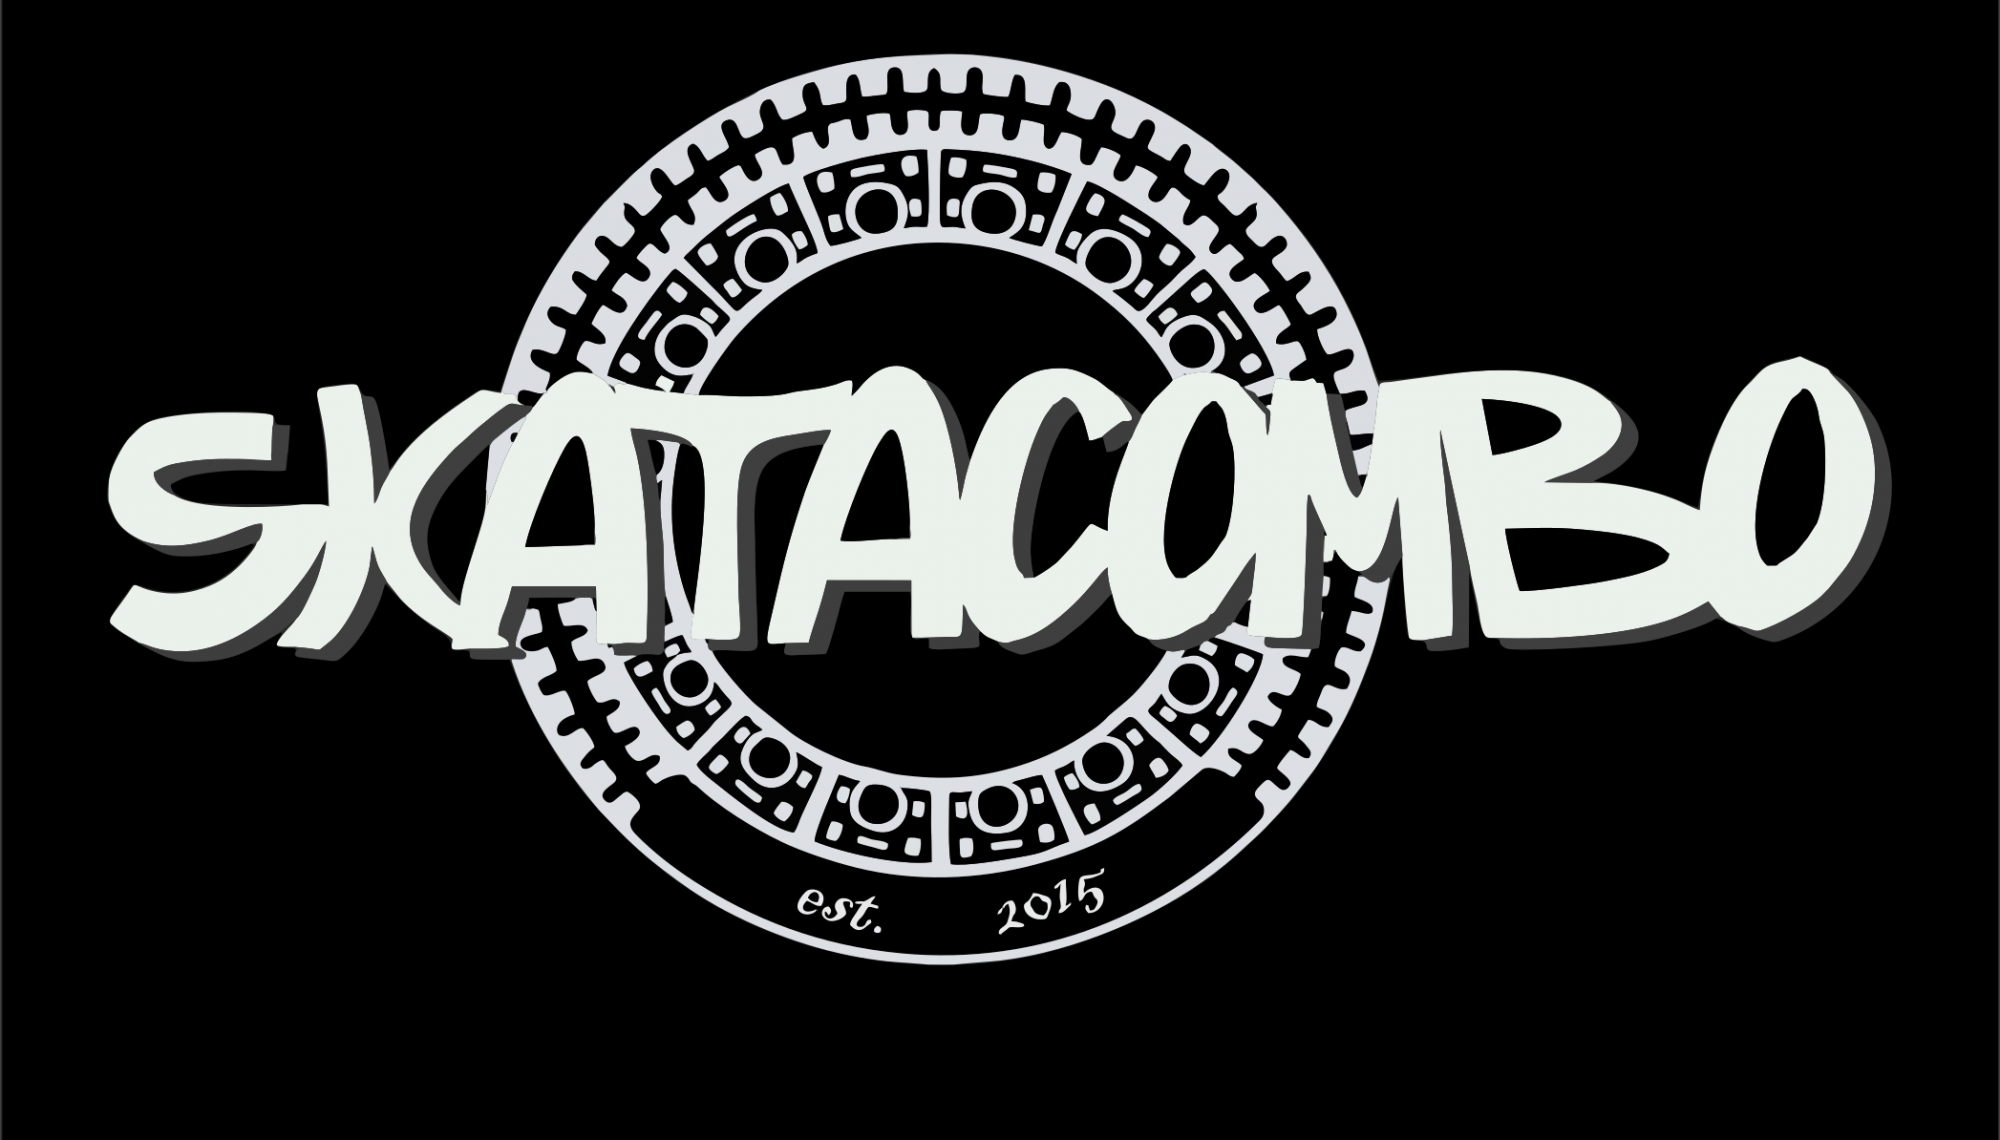 Skatacombo